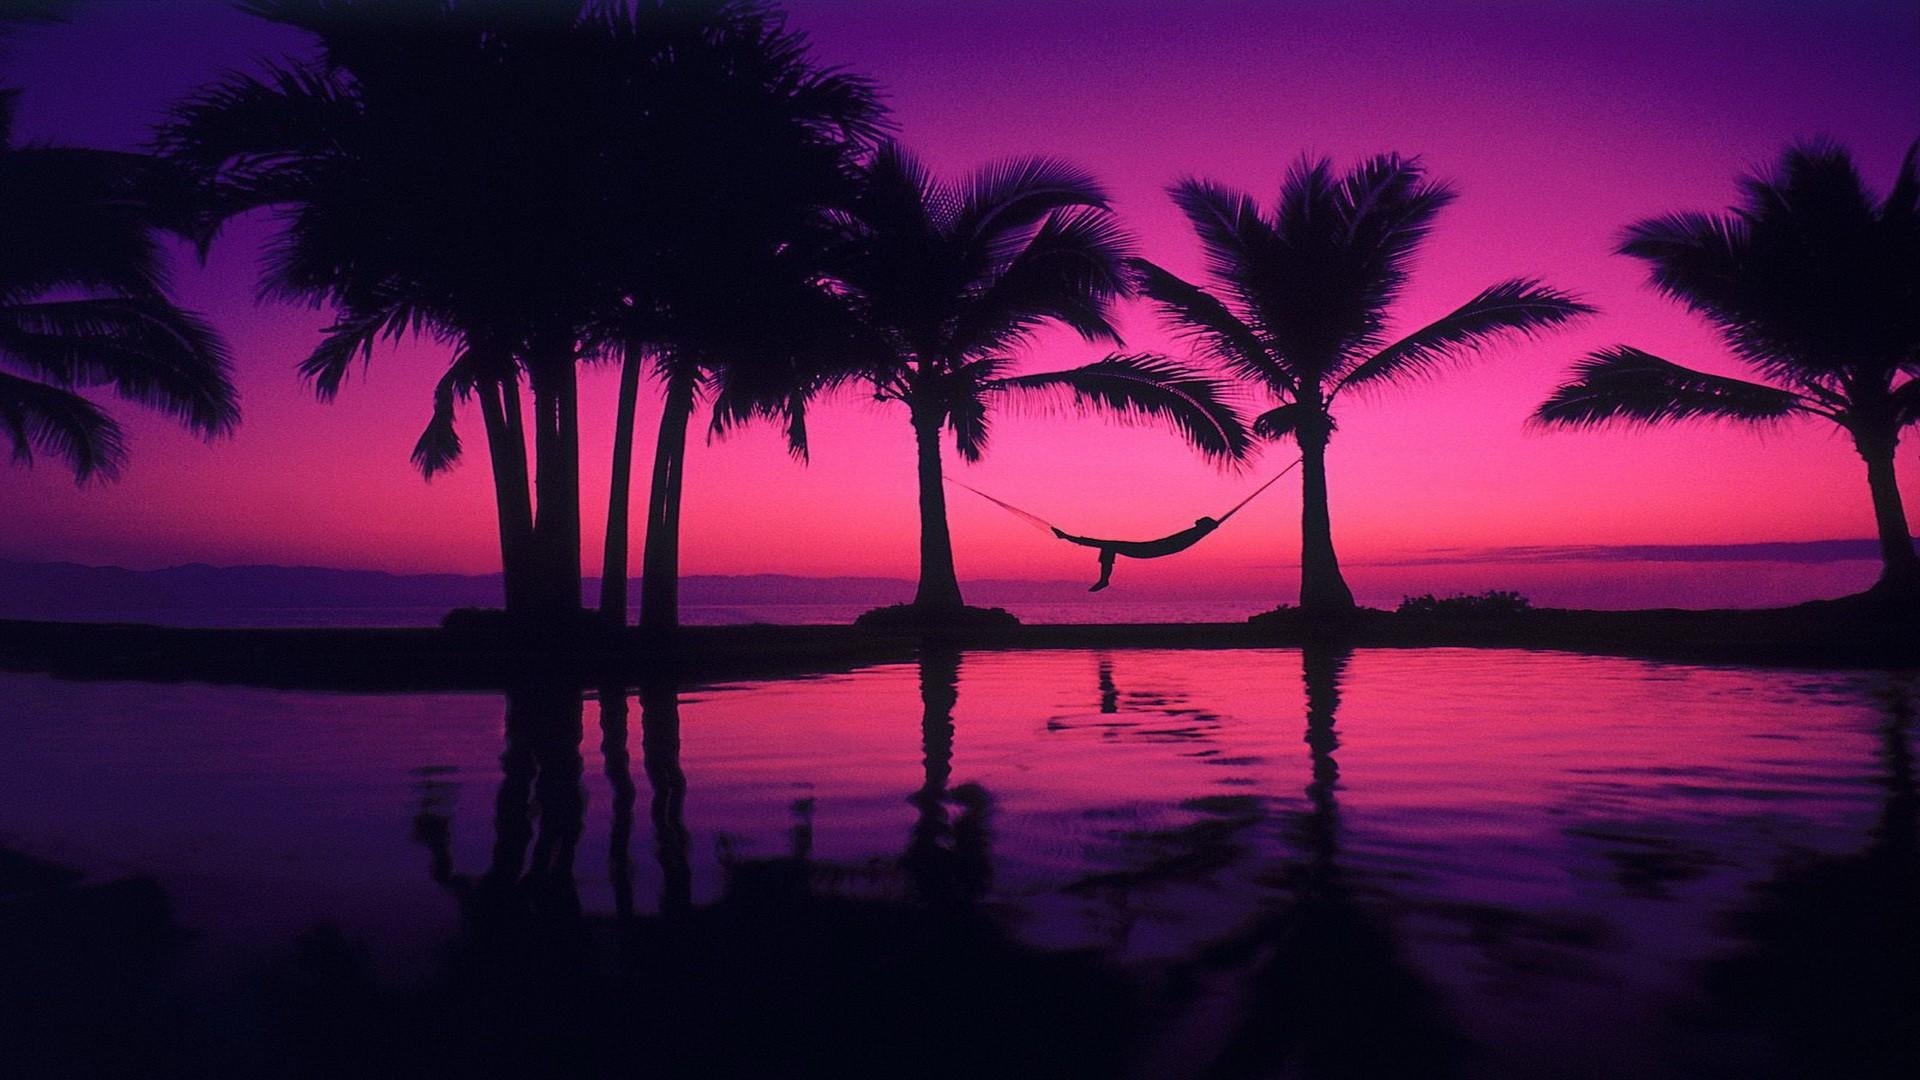 Palm Tree hd wallpaper download